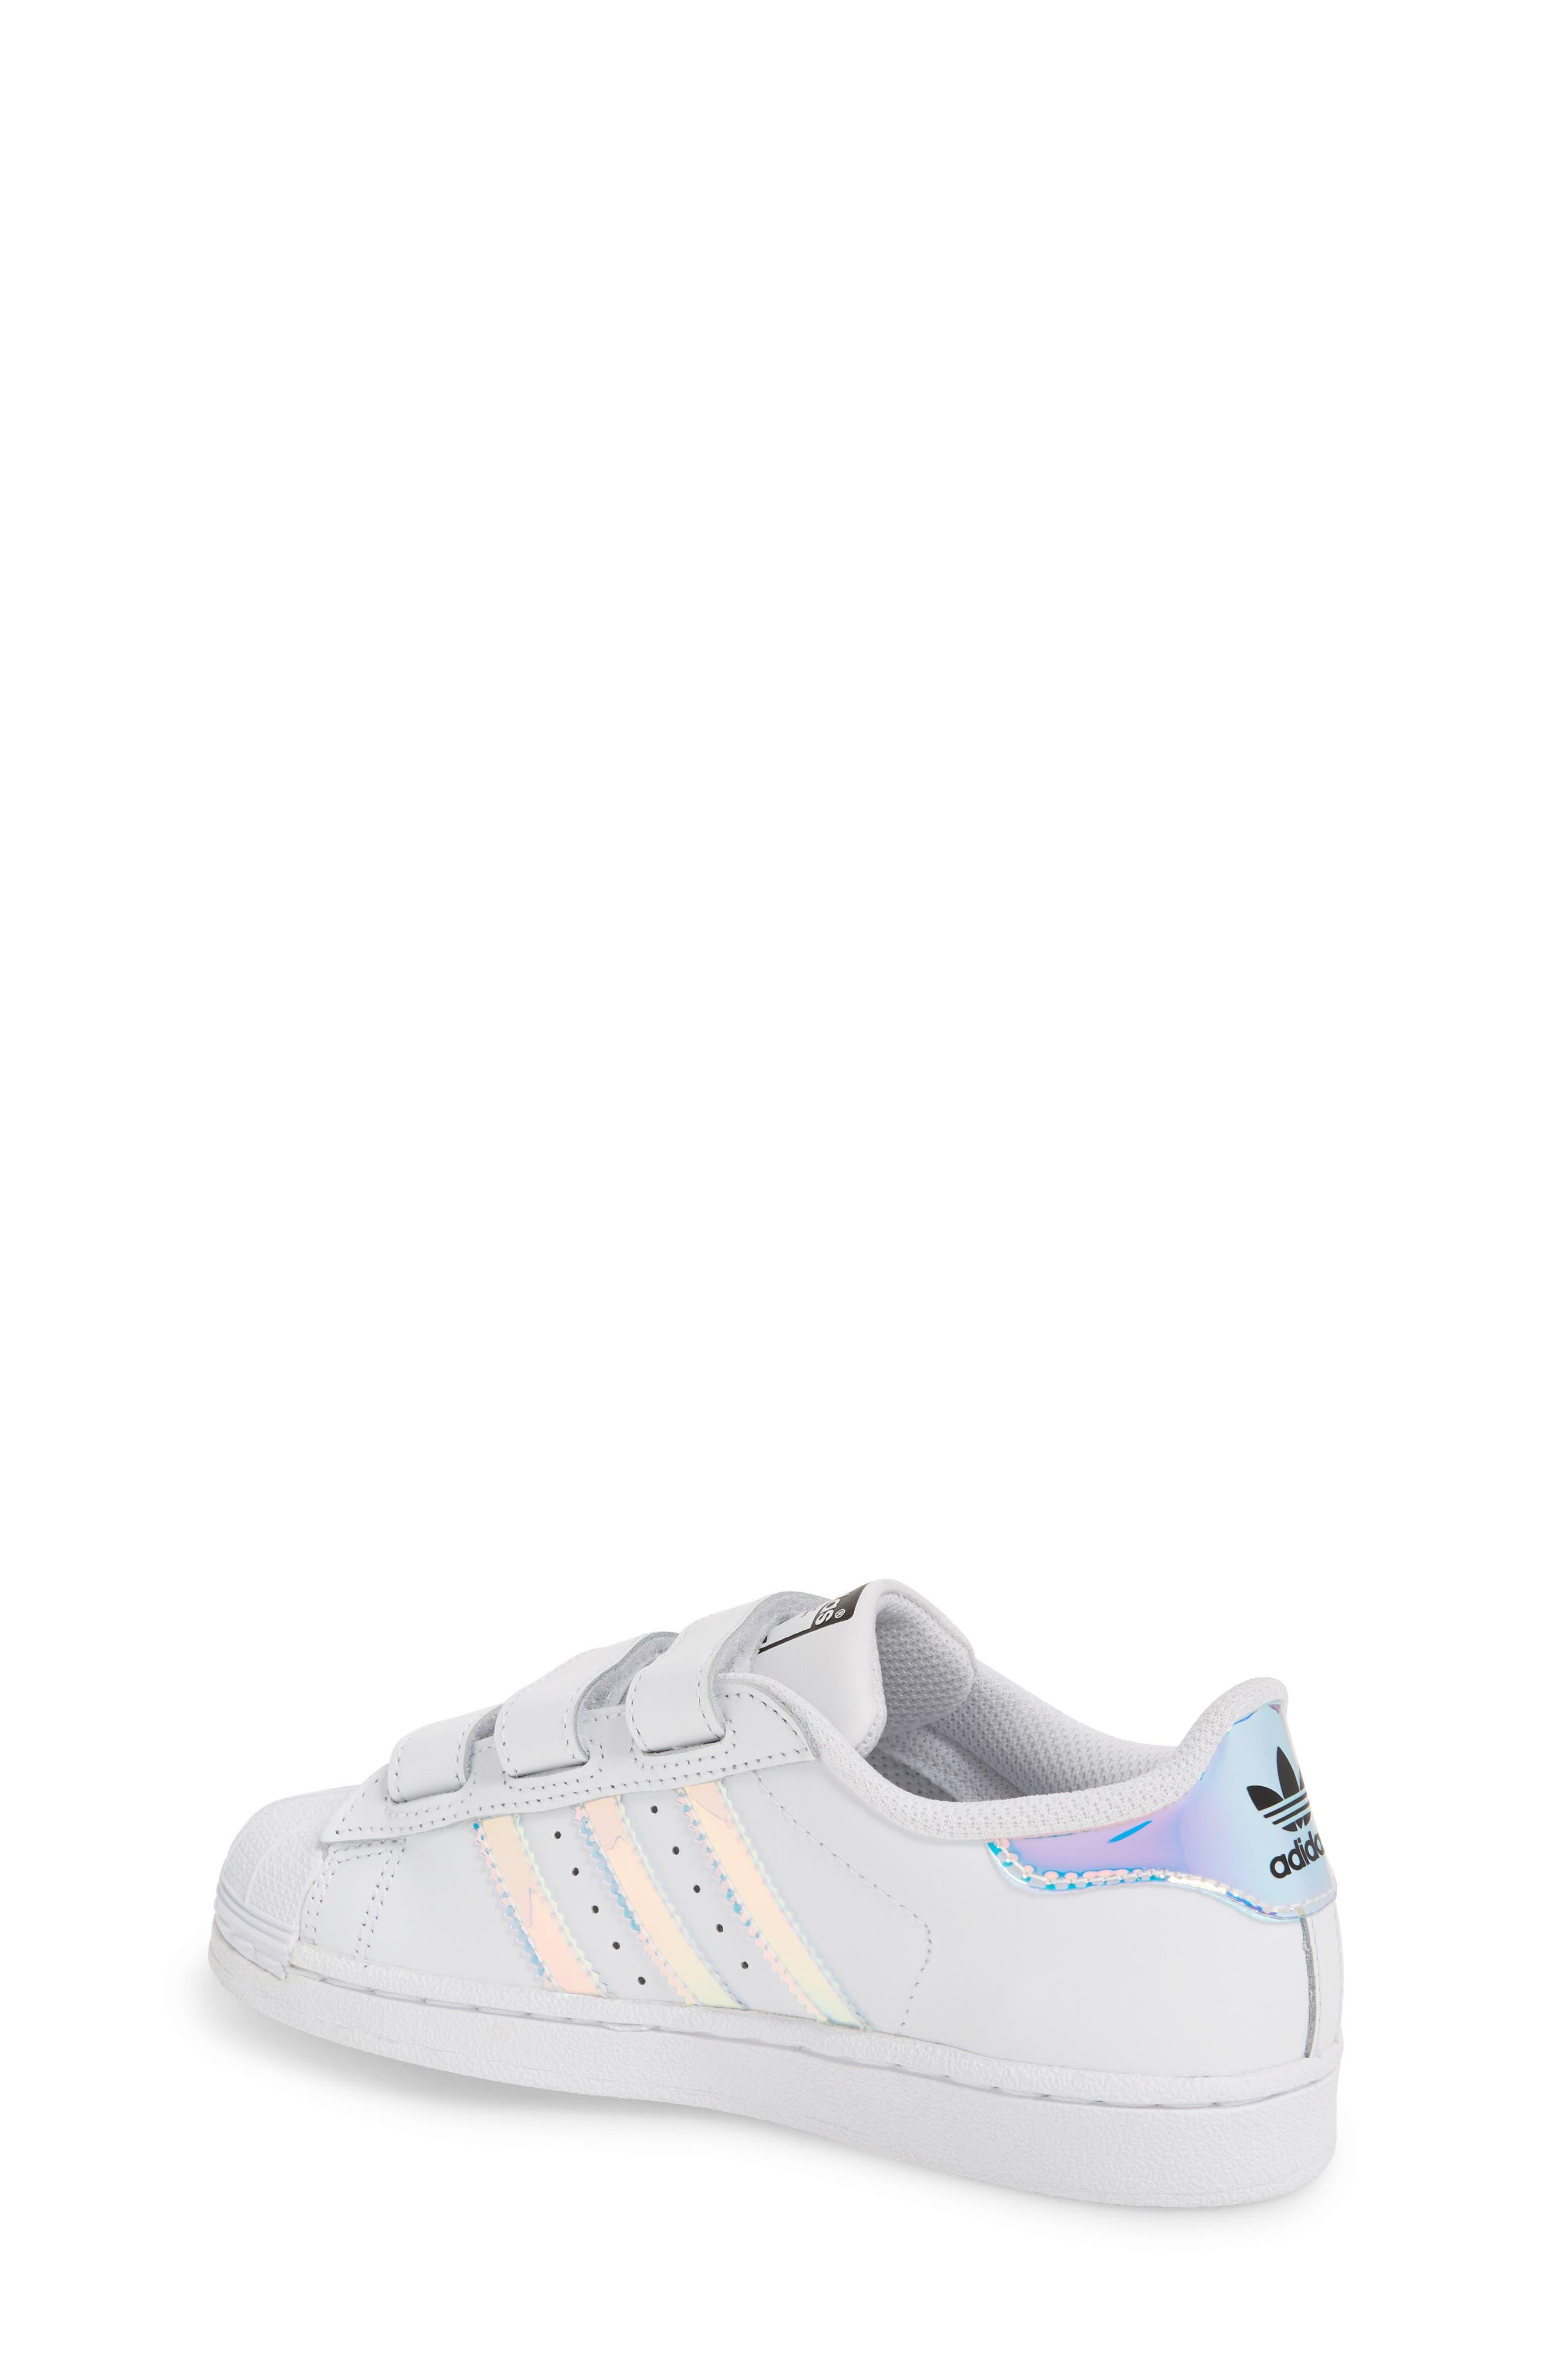 Superstar - Iridescent Sneaker,                             Alternate thumbnail 3, color,                             SILVER METALLIC/ WHITE